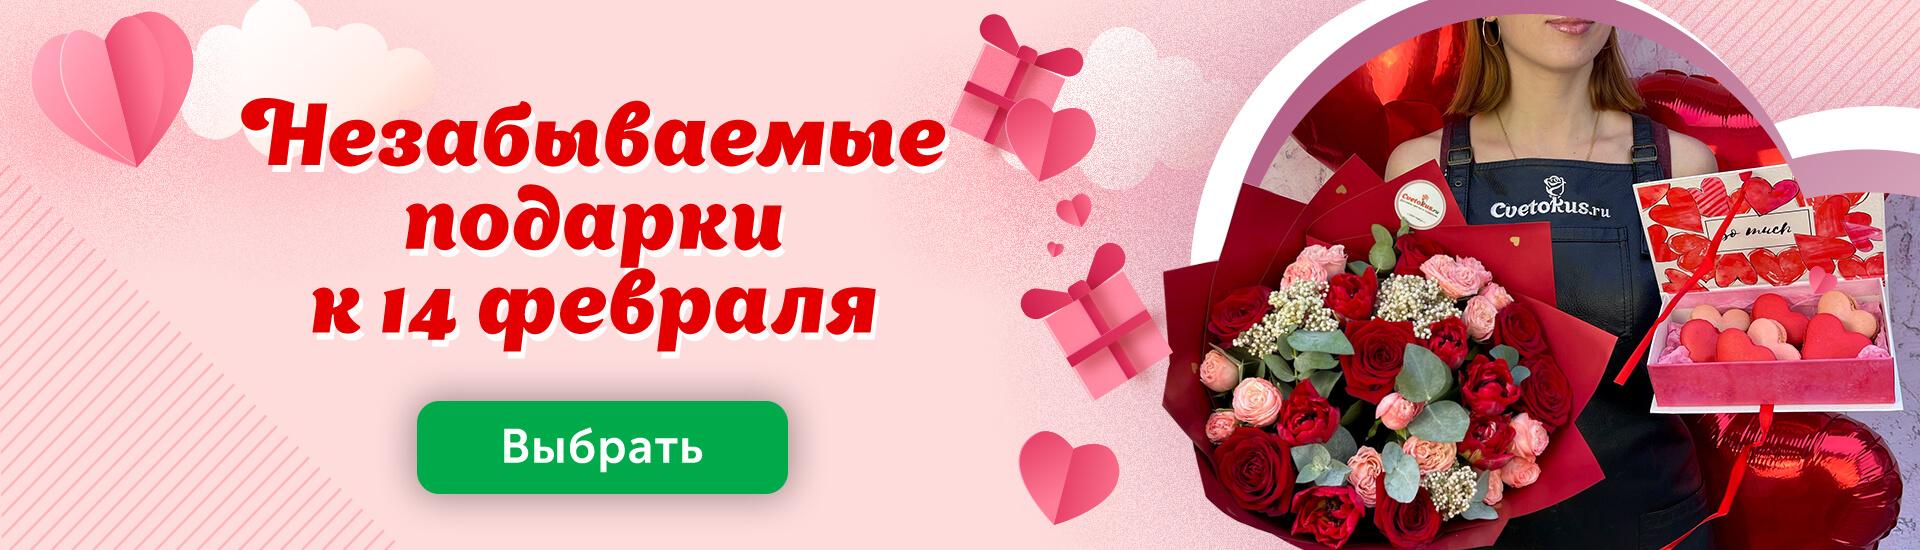 valentinday